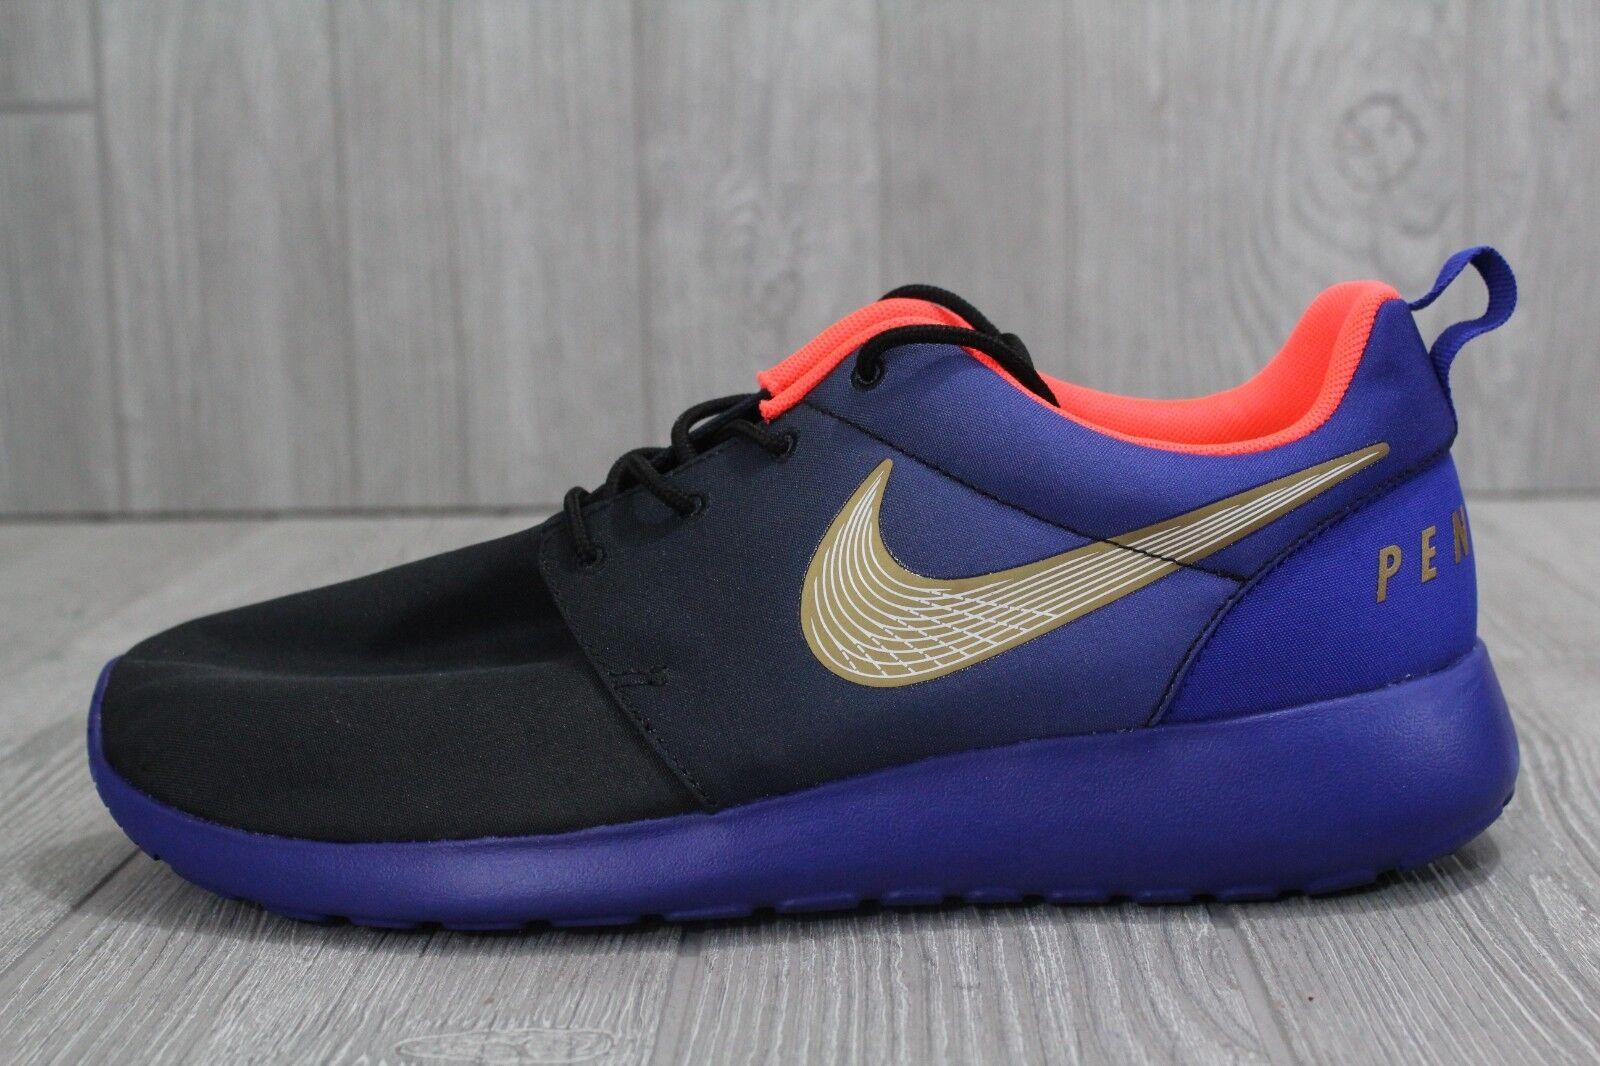 27 RARE Nike Roshe Run  Penn Relays  Edition bluee shoes 840799 075 SZ 10